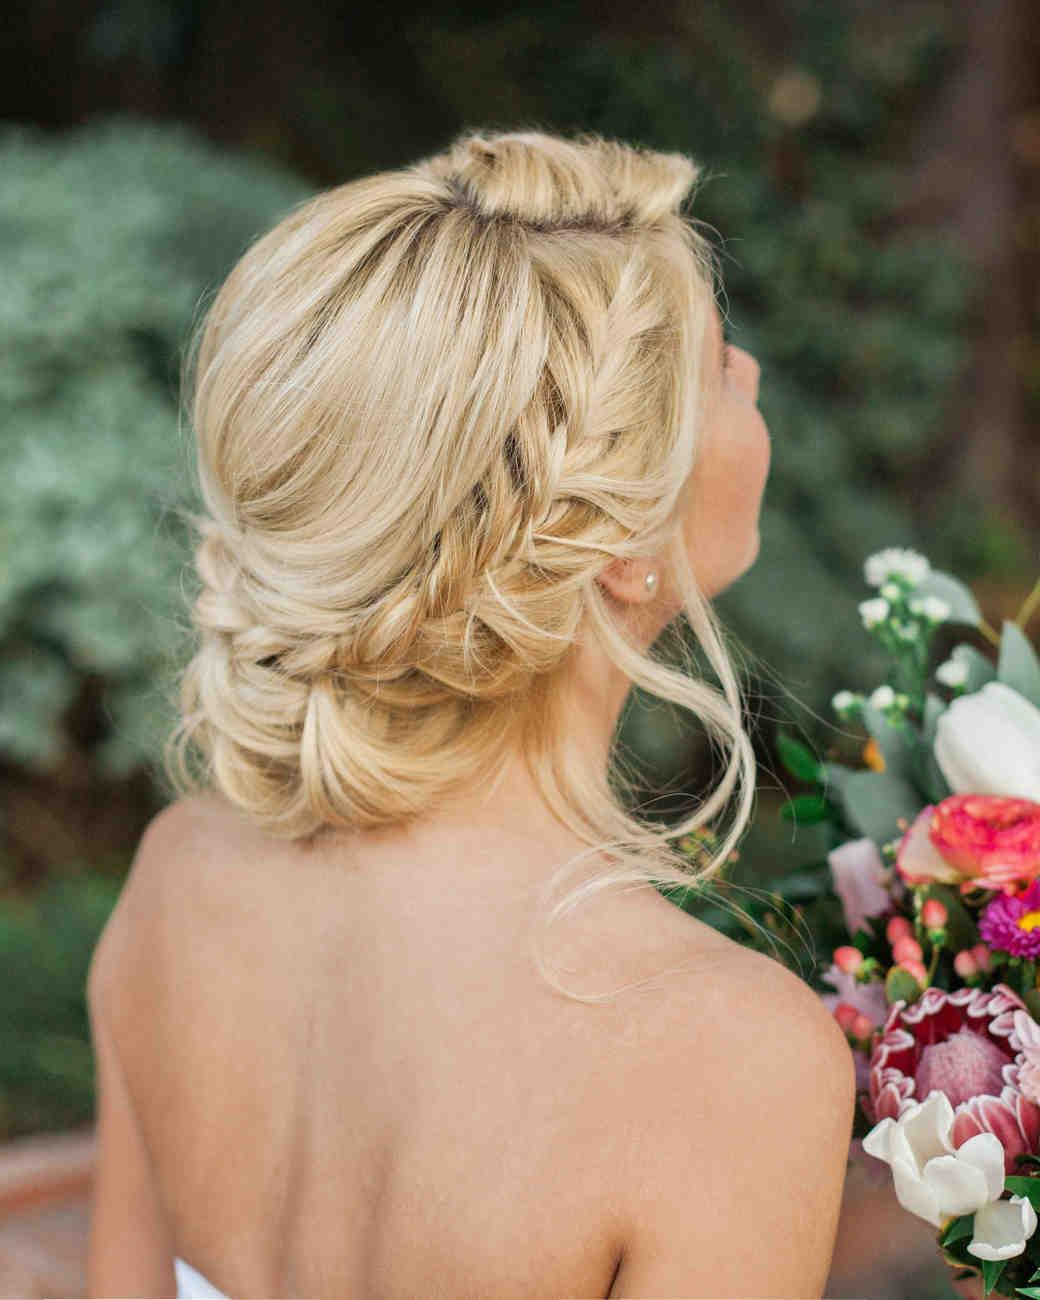 10 Ways To Upgrade The Wedding Braid Martha Stewart Weddings